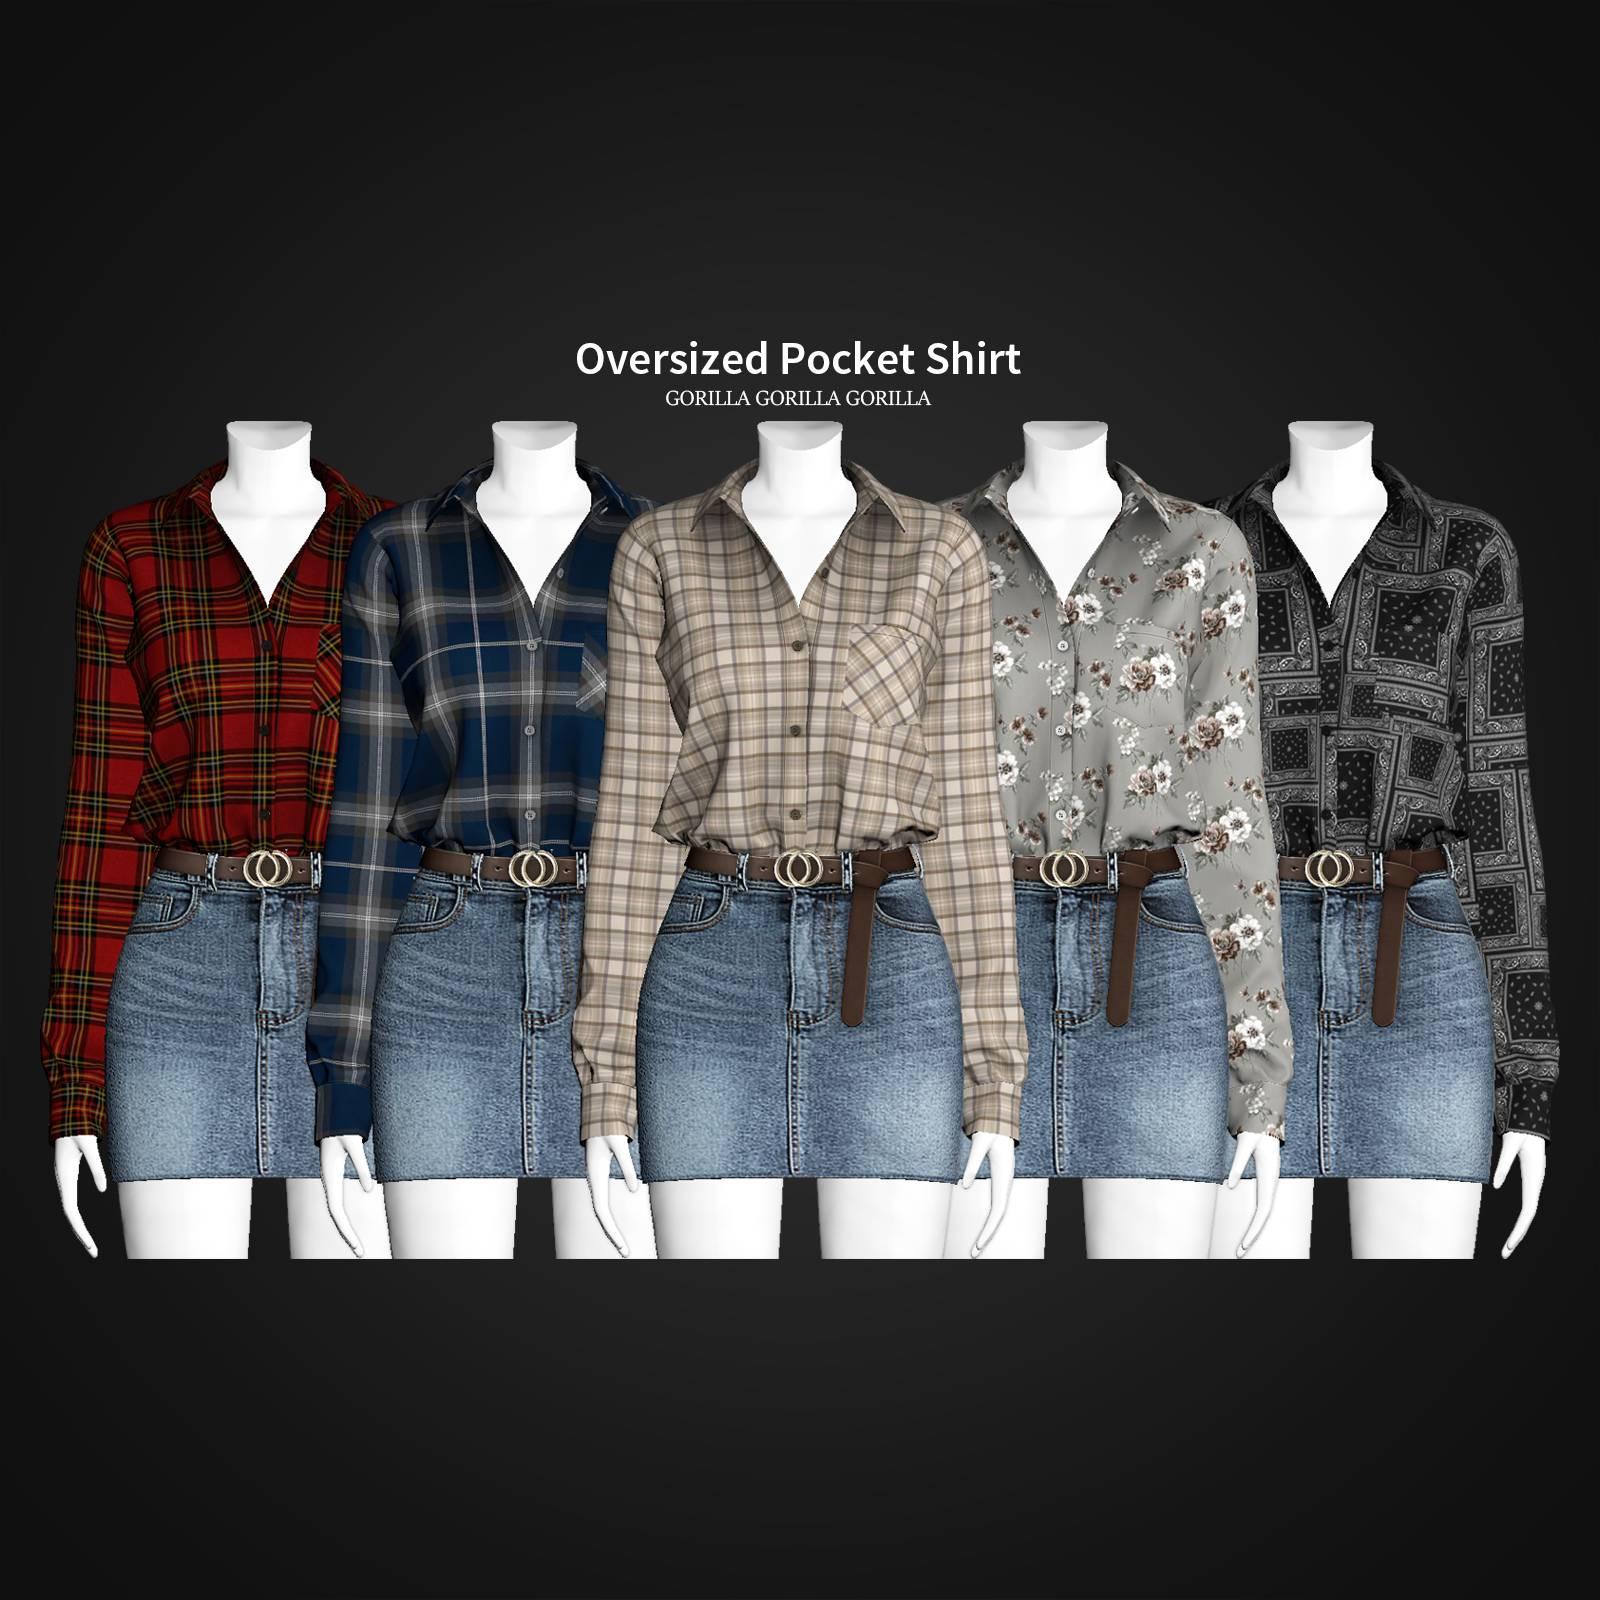 Женская рубашка - Oversized Pocket Shirt